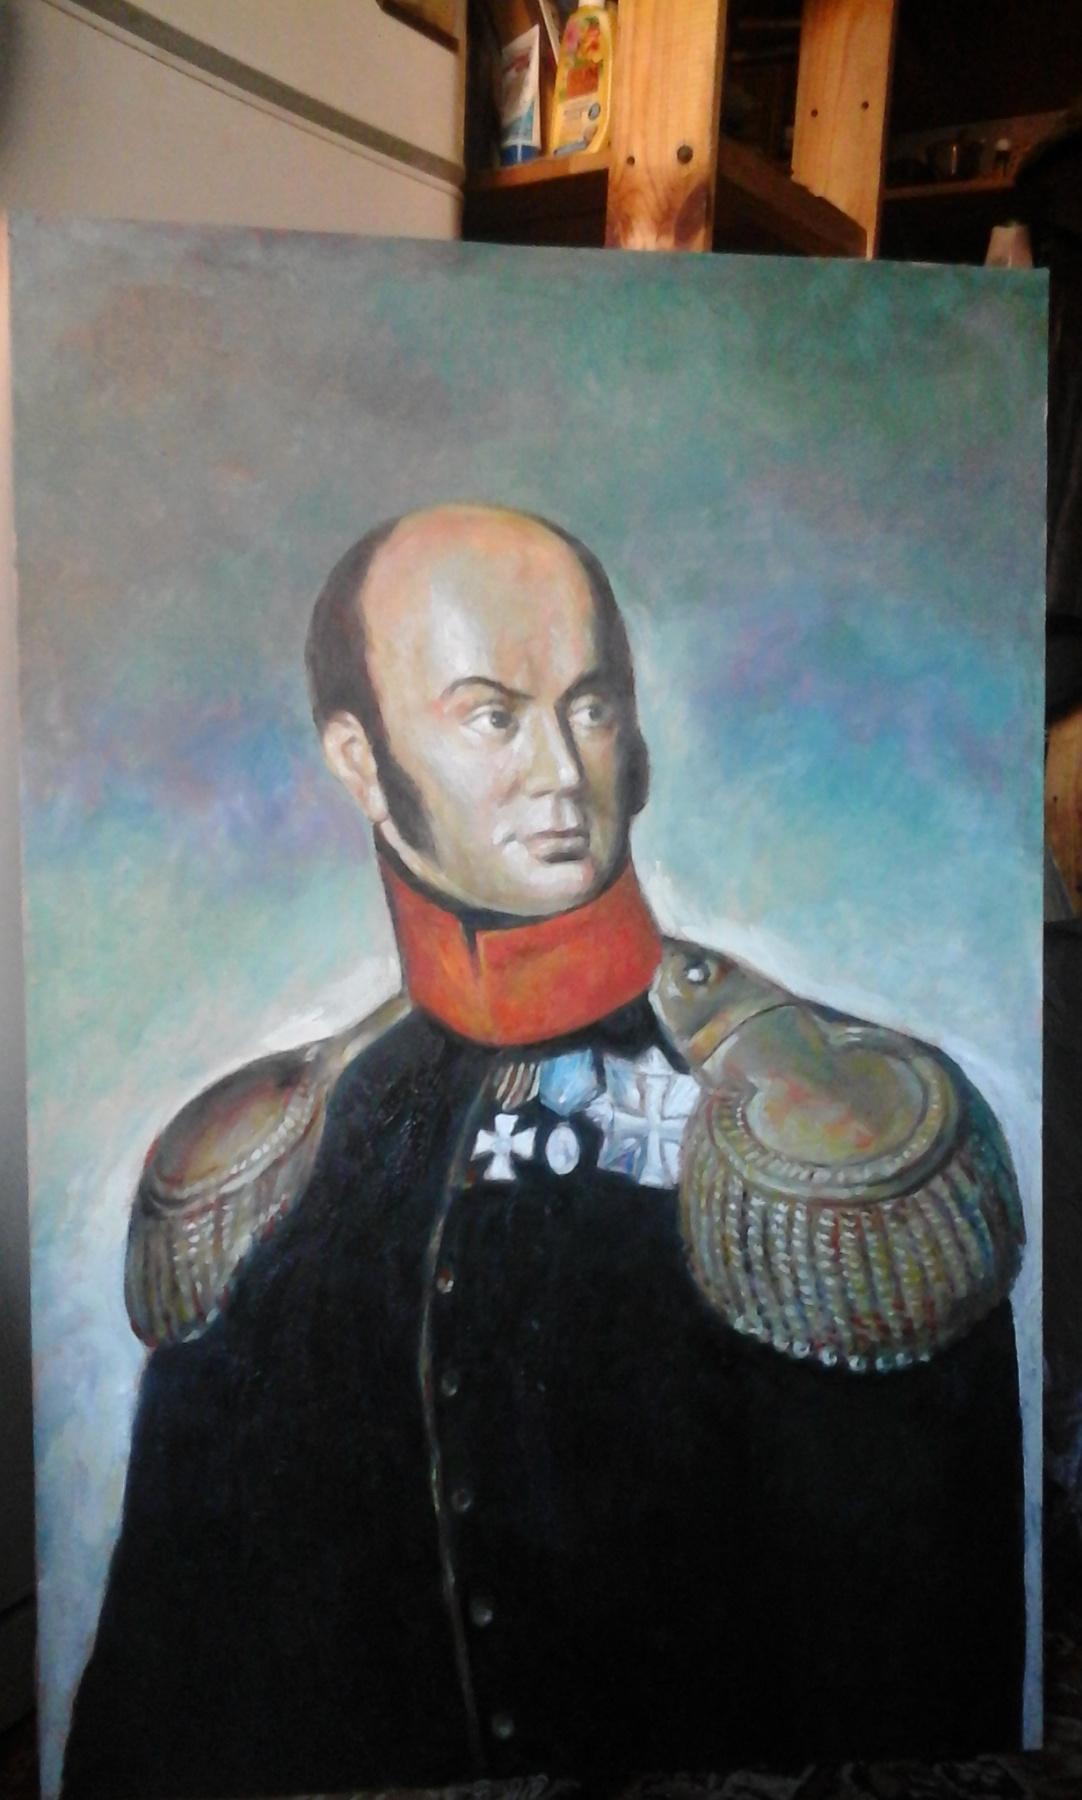 Valery Viktorovich Shechkin. Portrait of the owner of the house Prechistenka 10